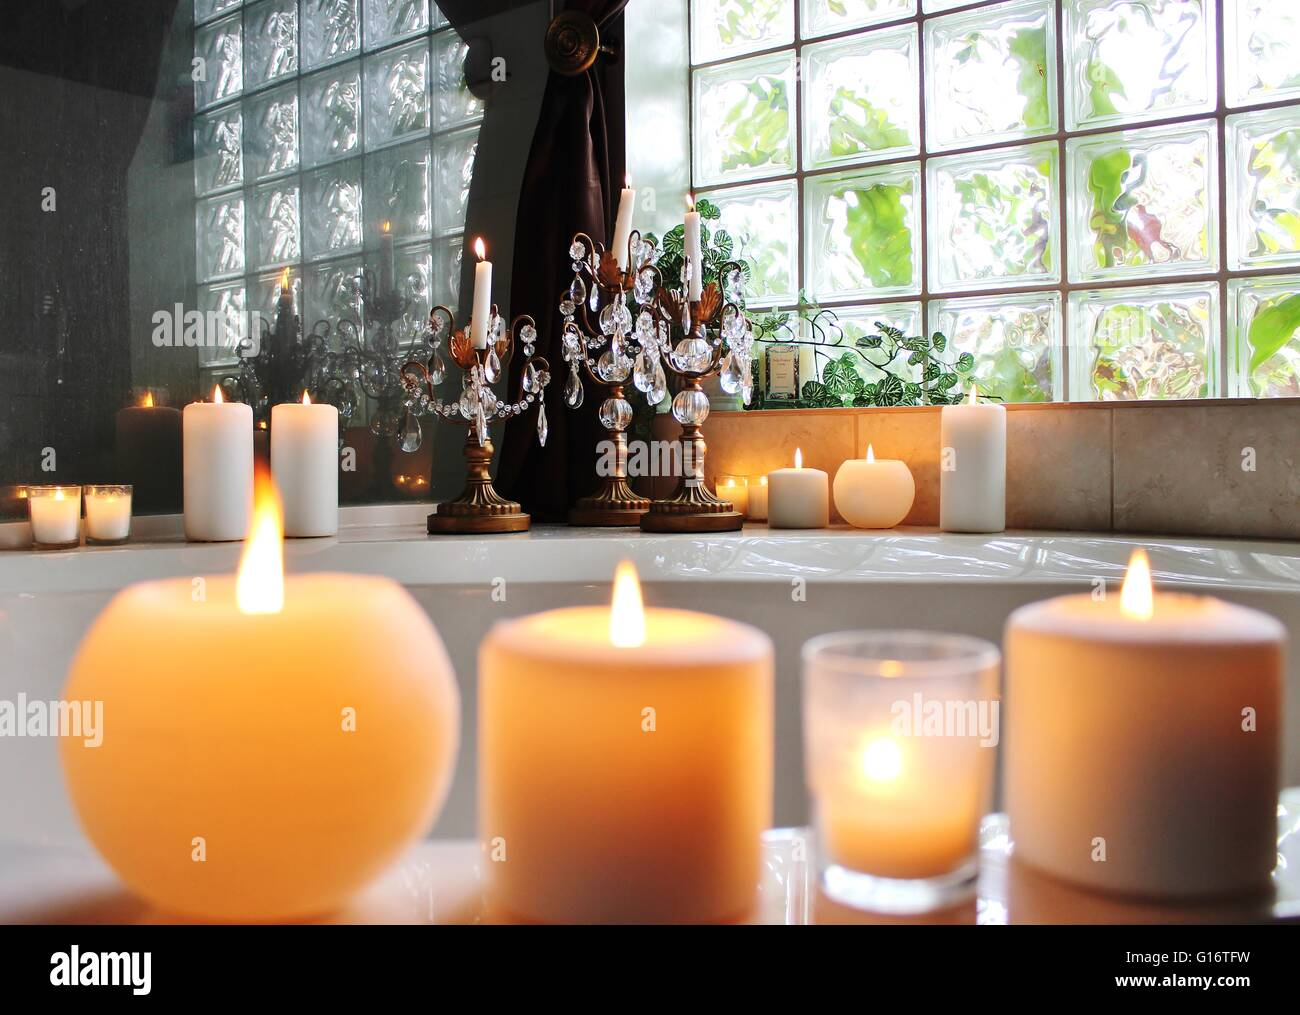 candles on the bathtub stock photo 104027837 alamy rh alamy com